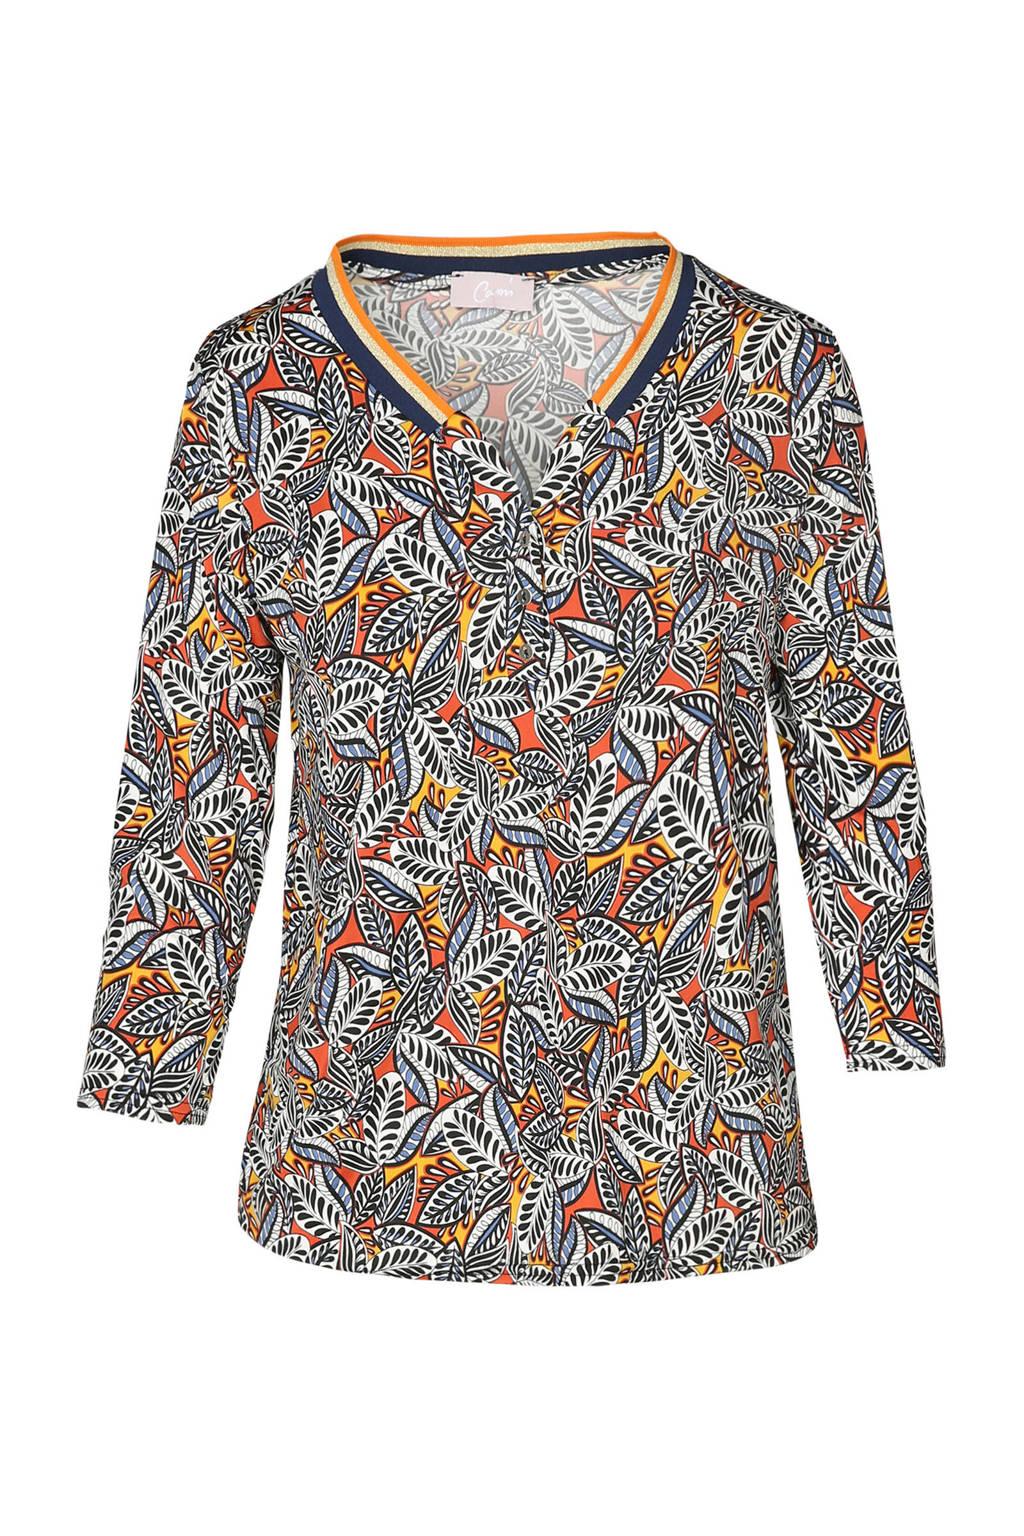 Cassis T-shirt met allover print, Oker